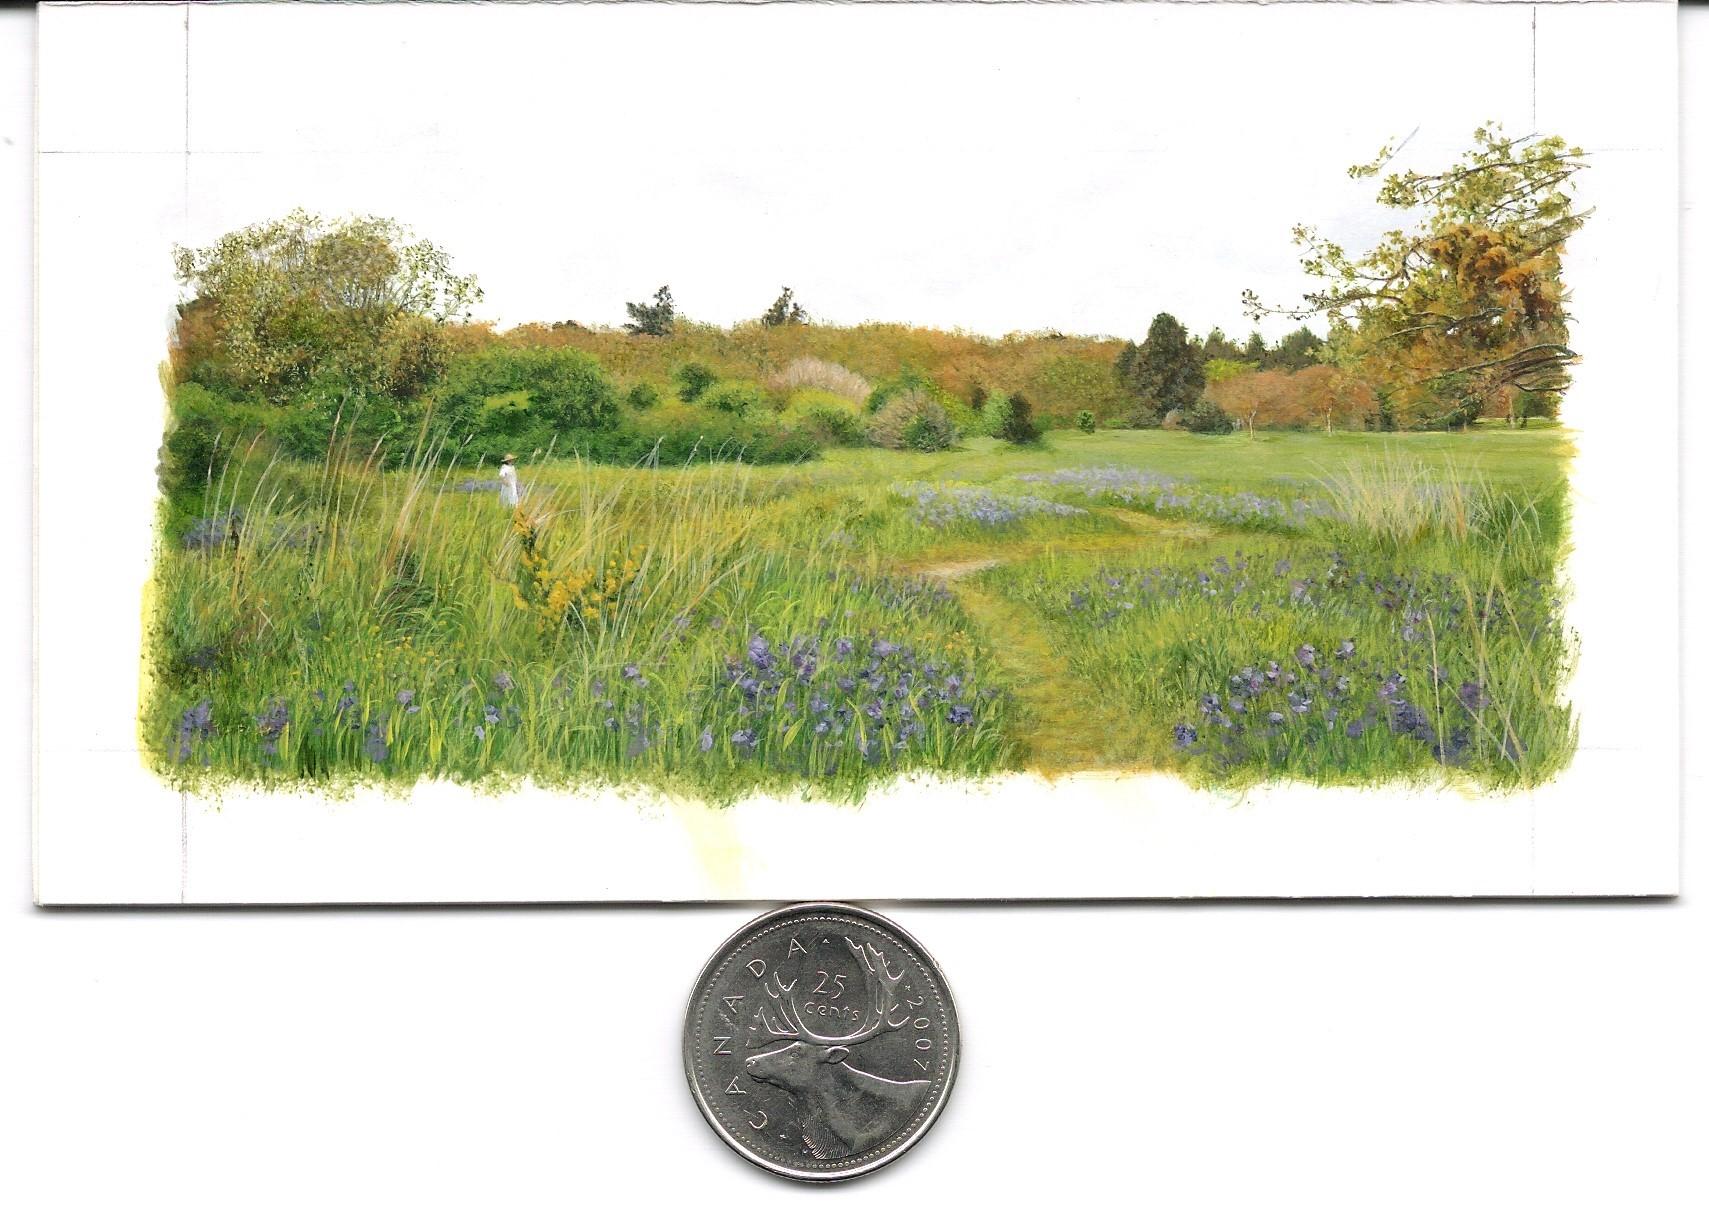 Walk Through the Park (2 x 4.5 inches) Quarter